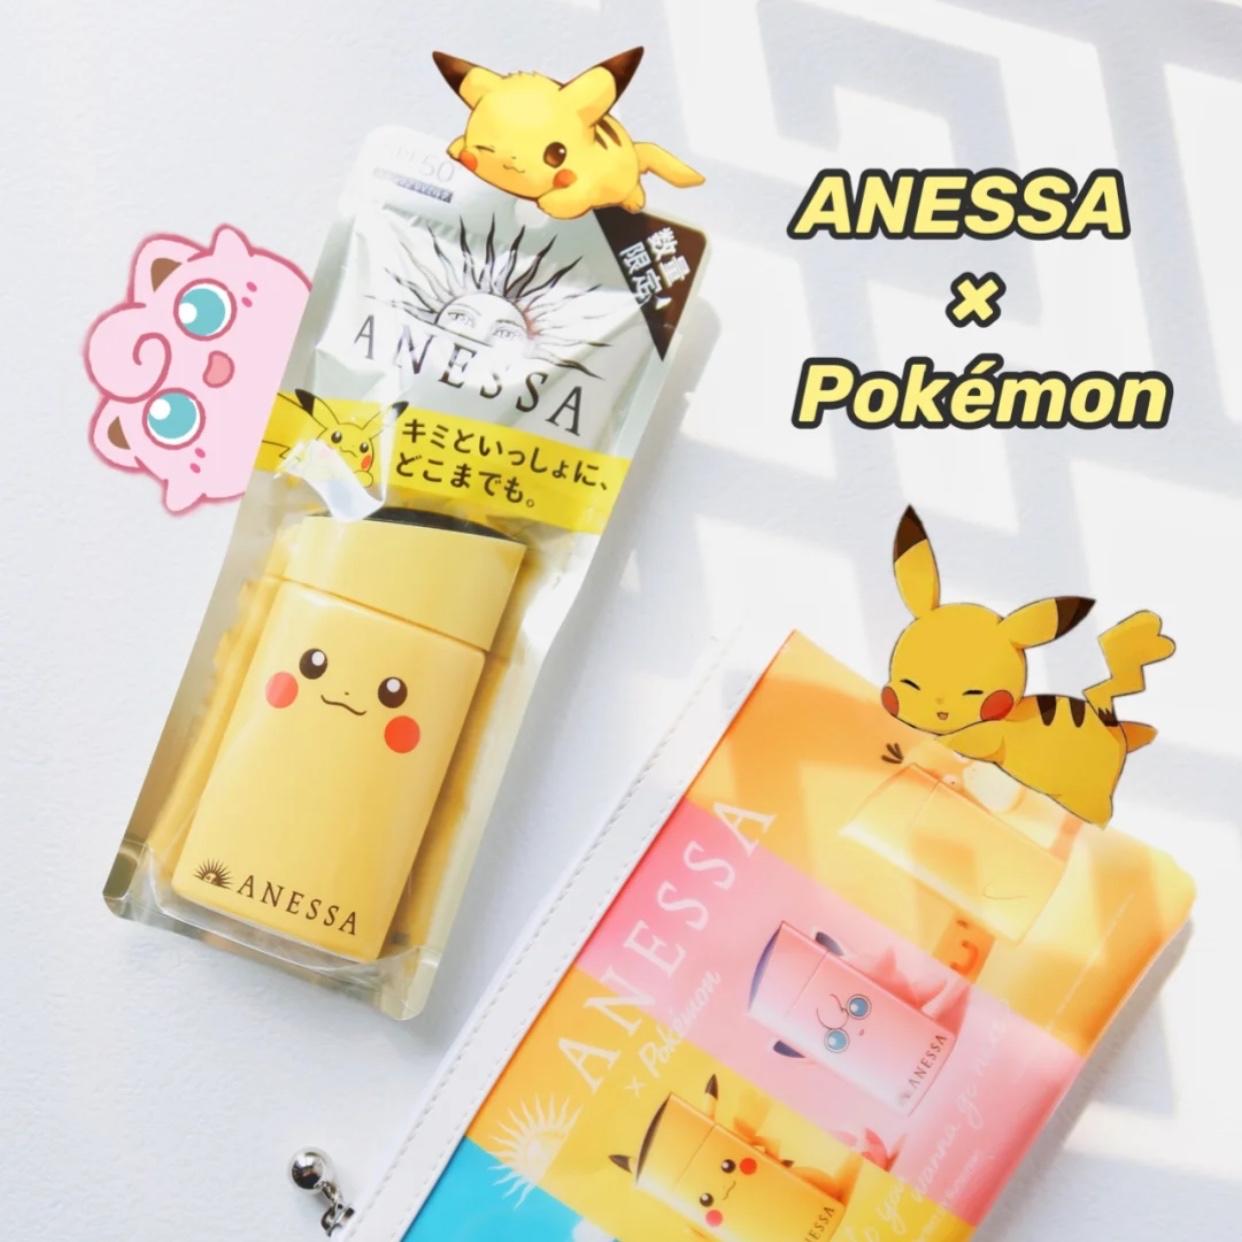 SHISEIDO ANESSA Golden Sun Cream 2021 Pokémon Co-branded Pikachu 60ml giá  cạnh tranh